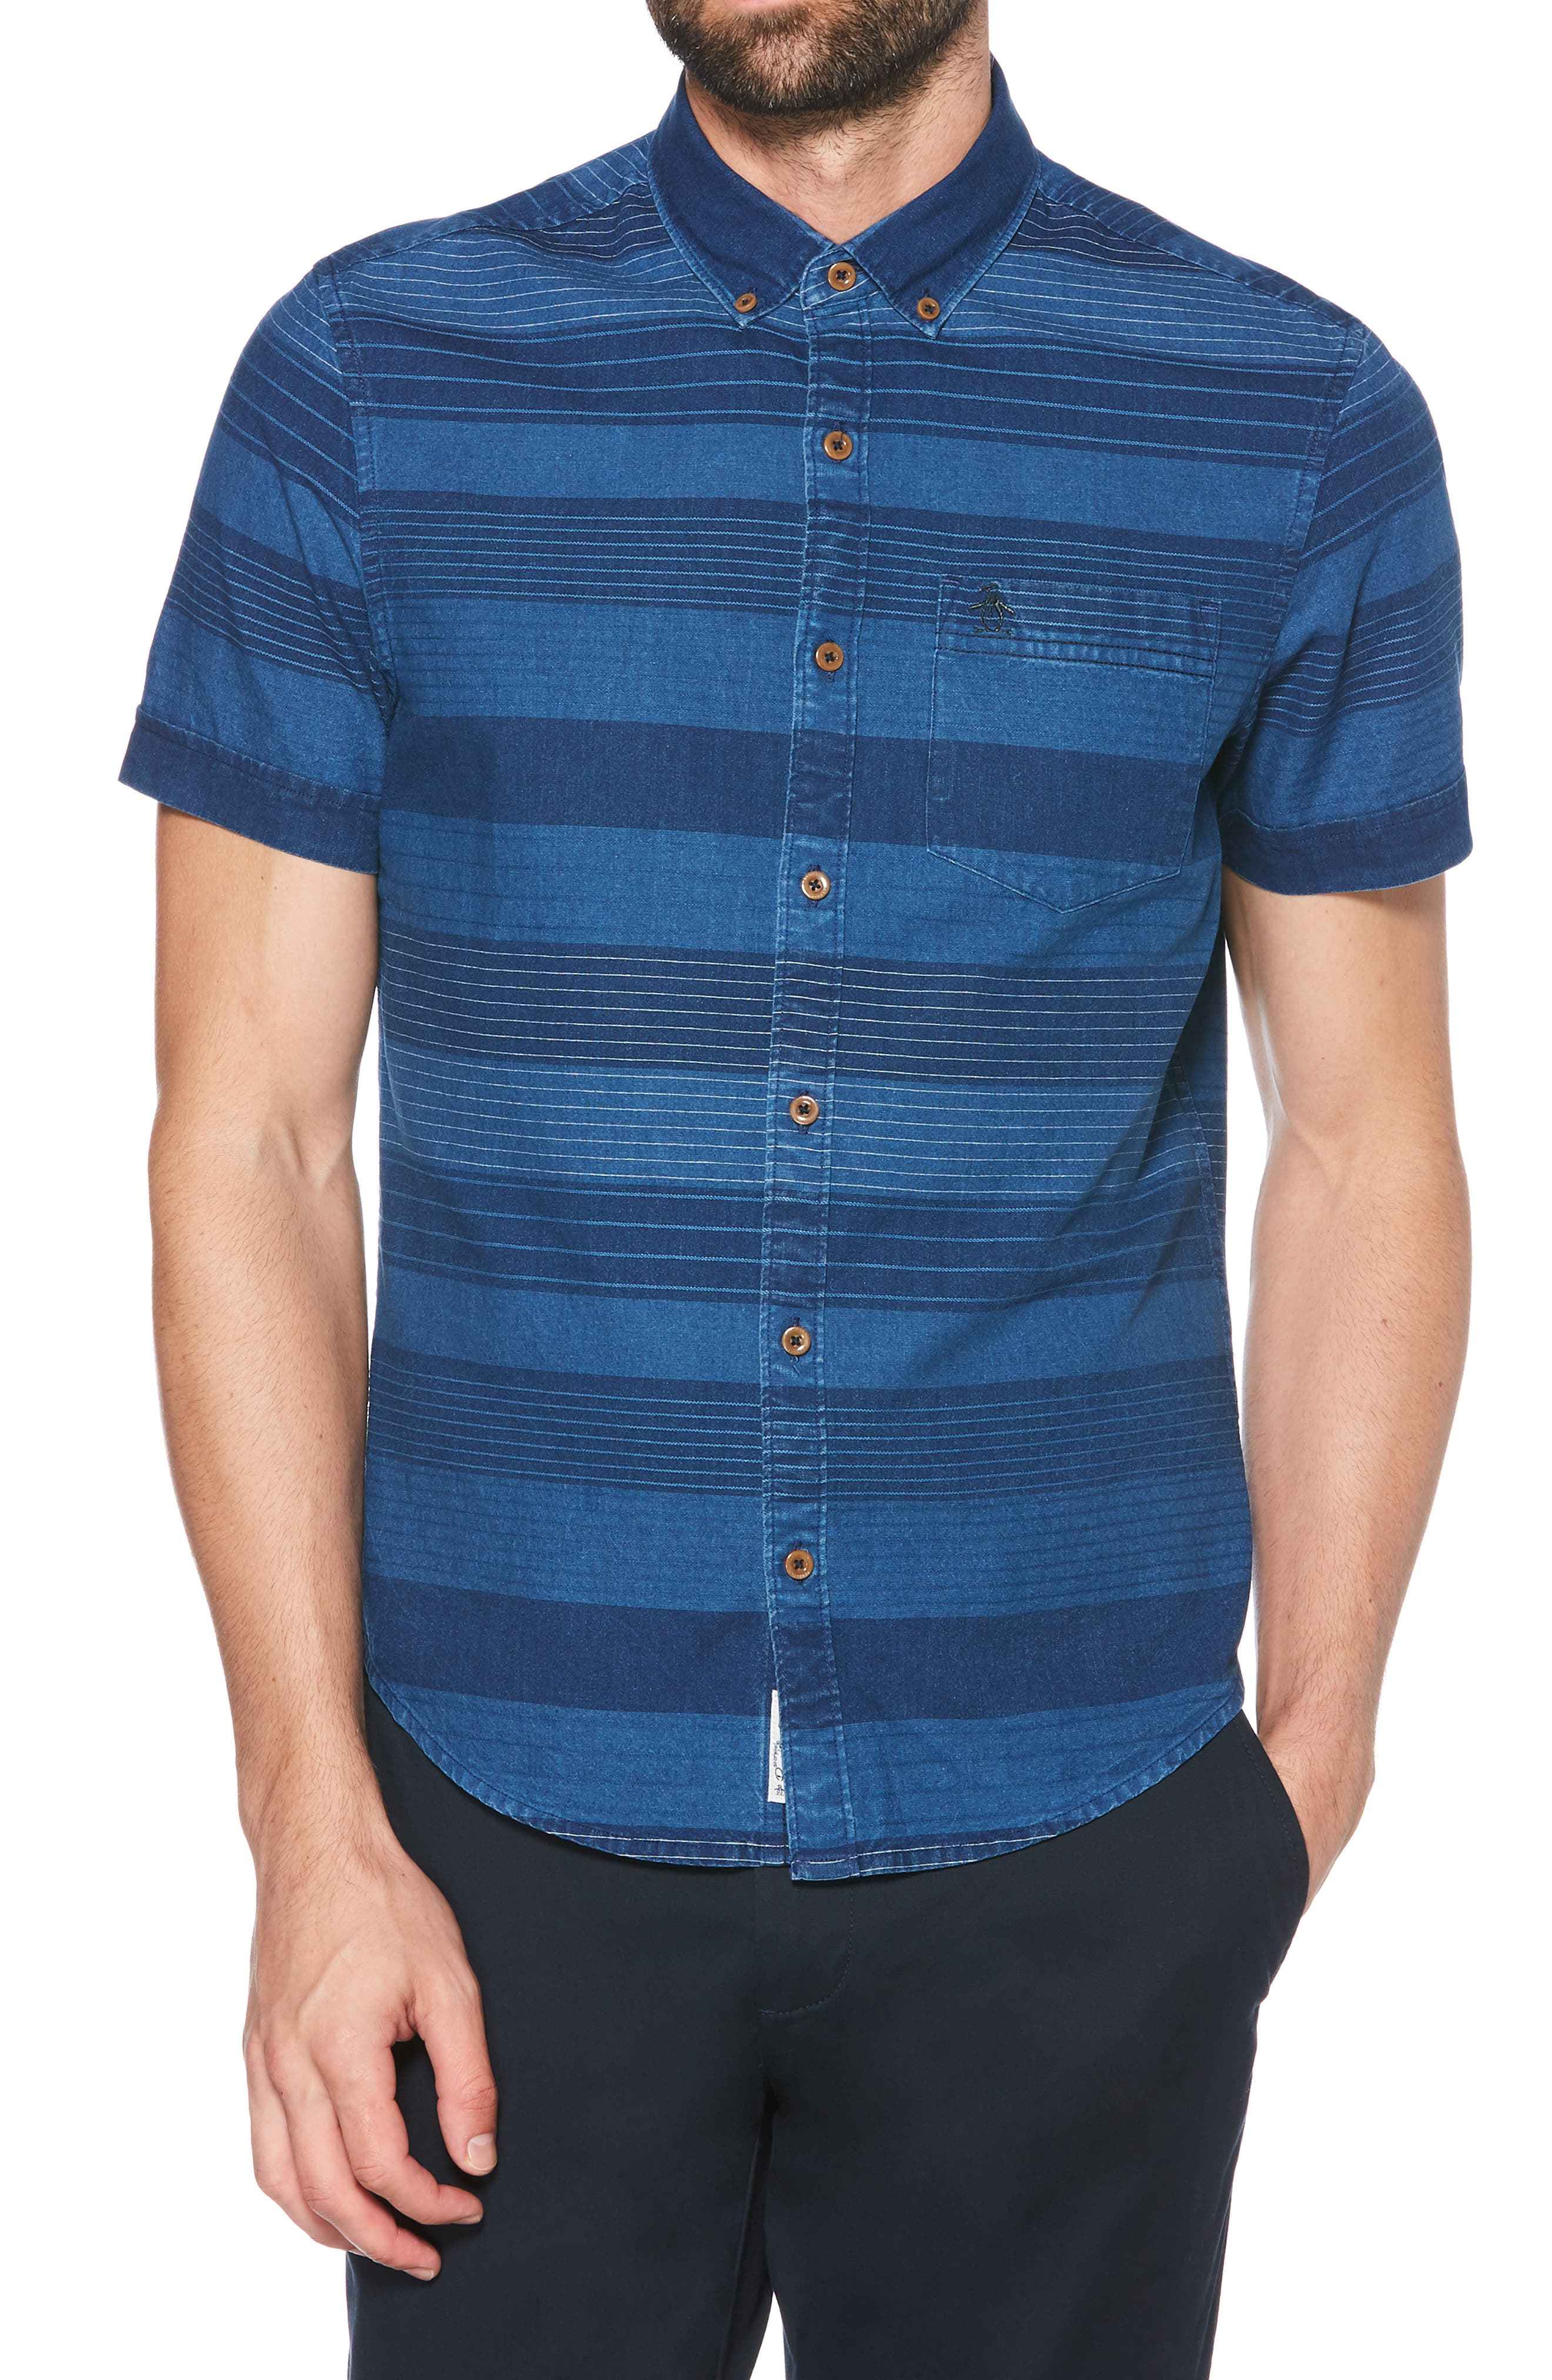 ORIGINAL PENGUIN Slim Fit Dobby Striped Sport Shirt, Main, color, DARK DENIM